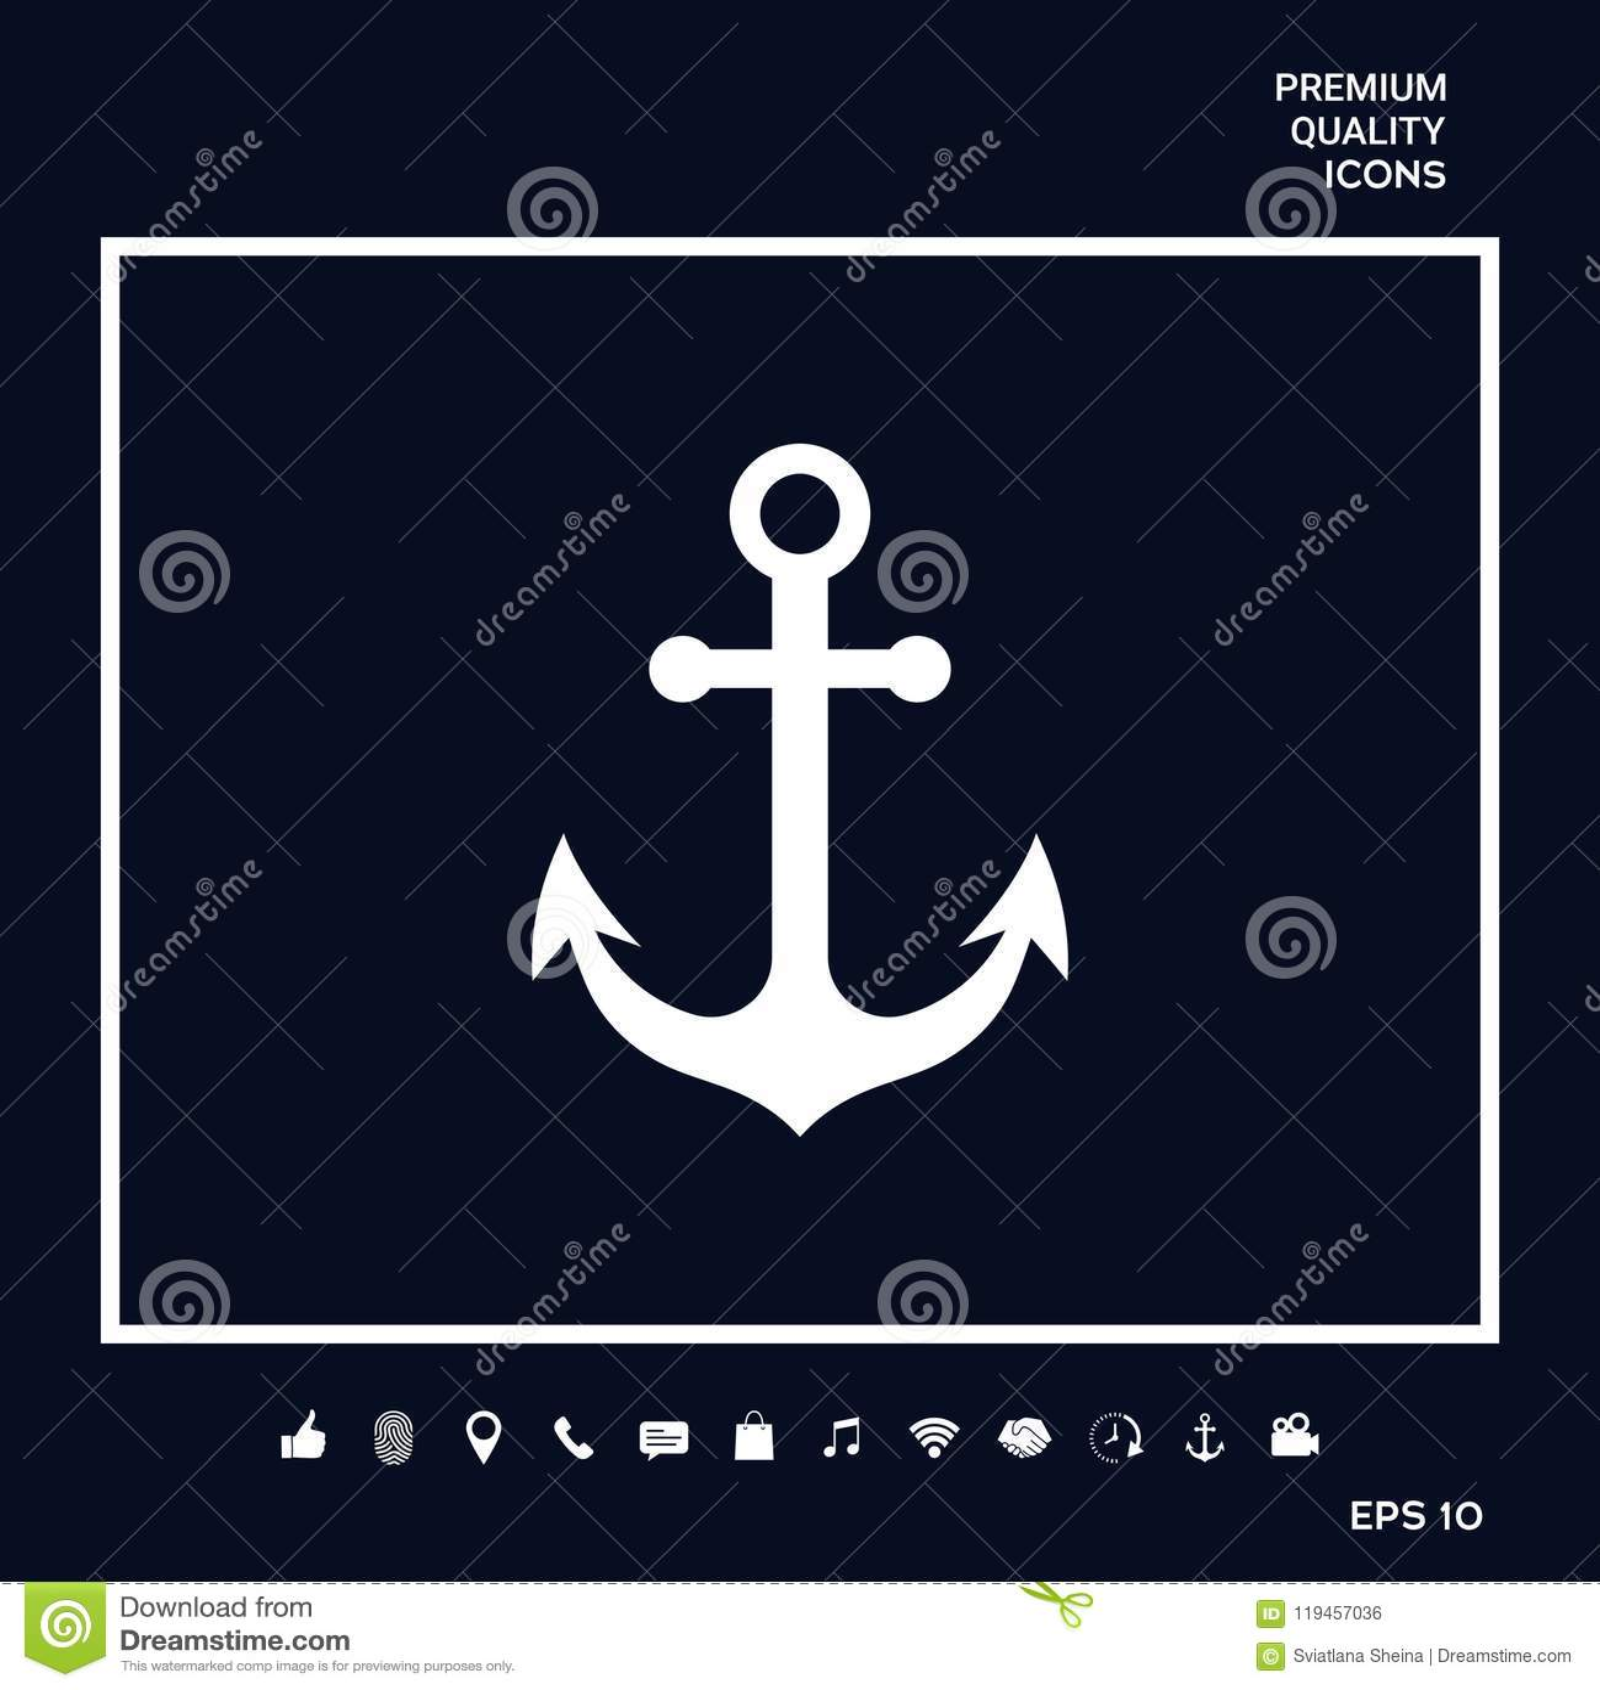 Anchor Icon Symbol Stock Vector Illustration Of Graphic 119457036